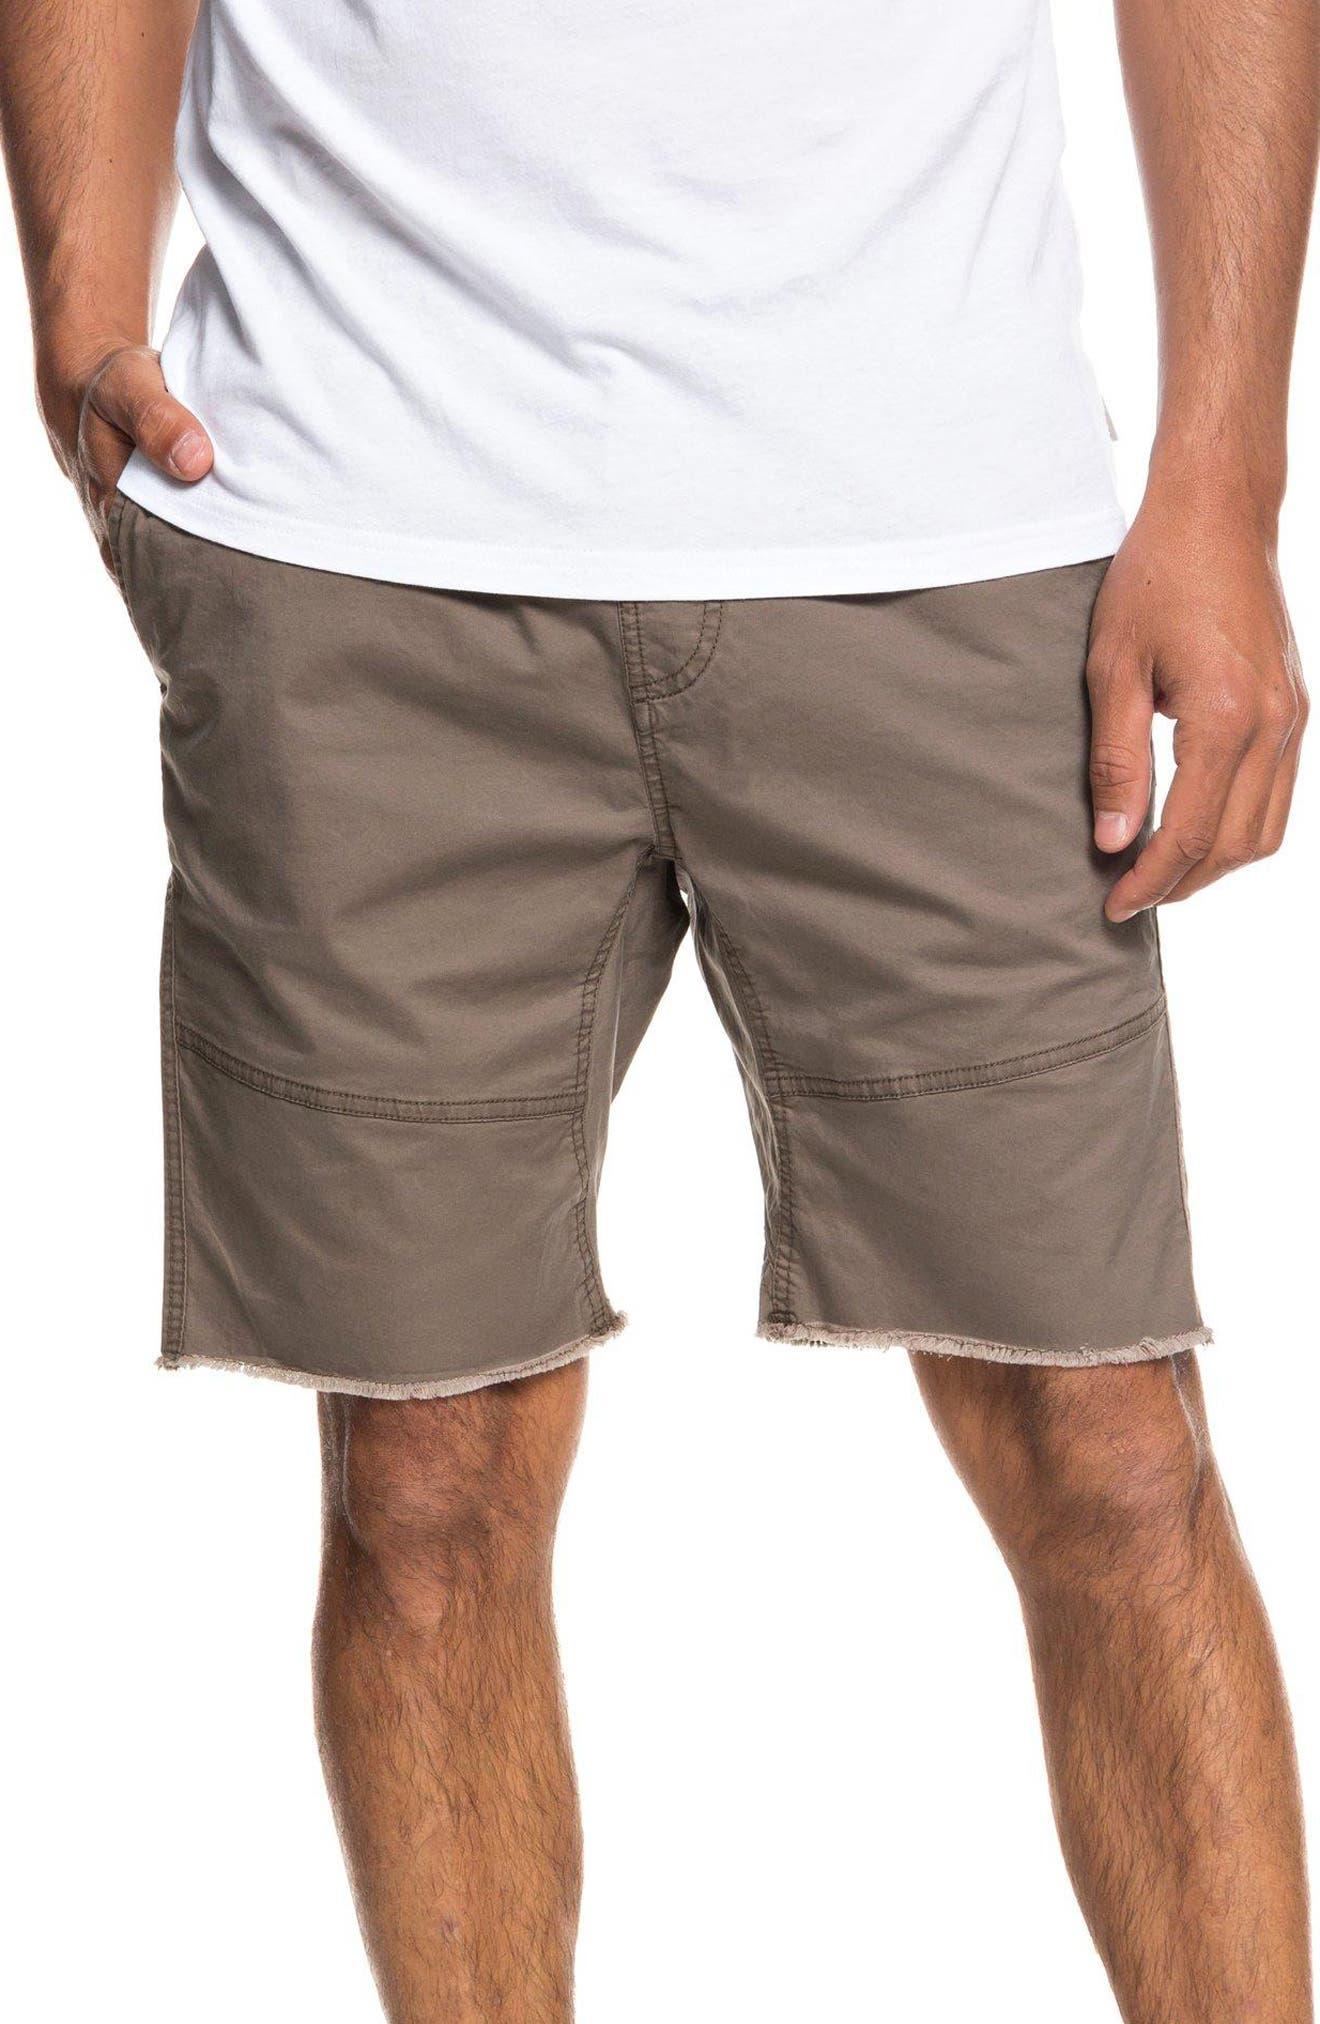 Foxoy Shorts,                         Main,                         color, FALCON